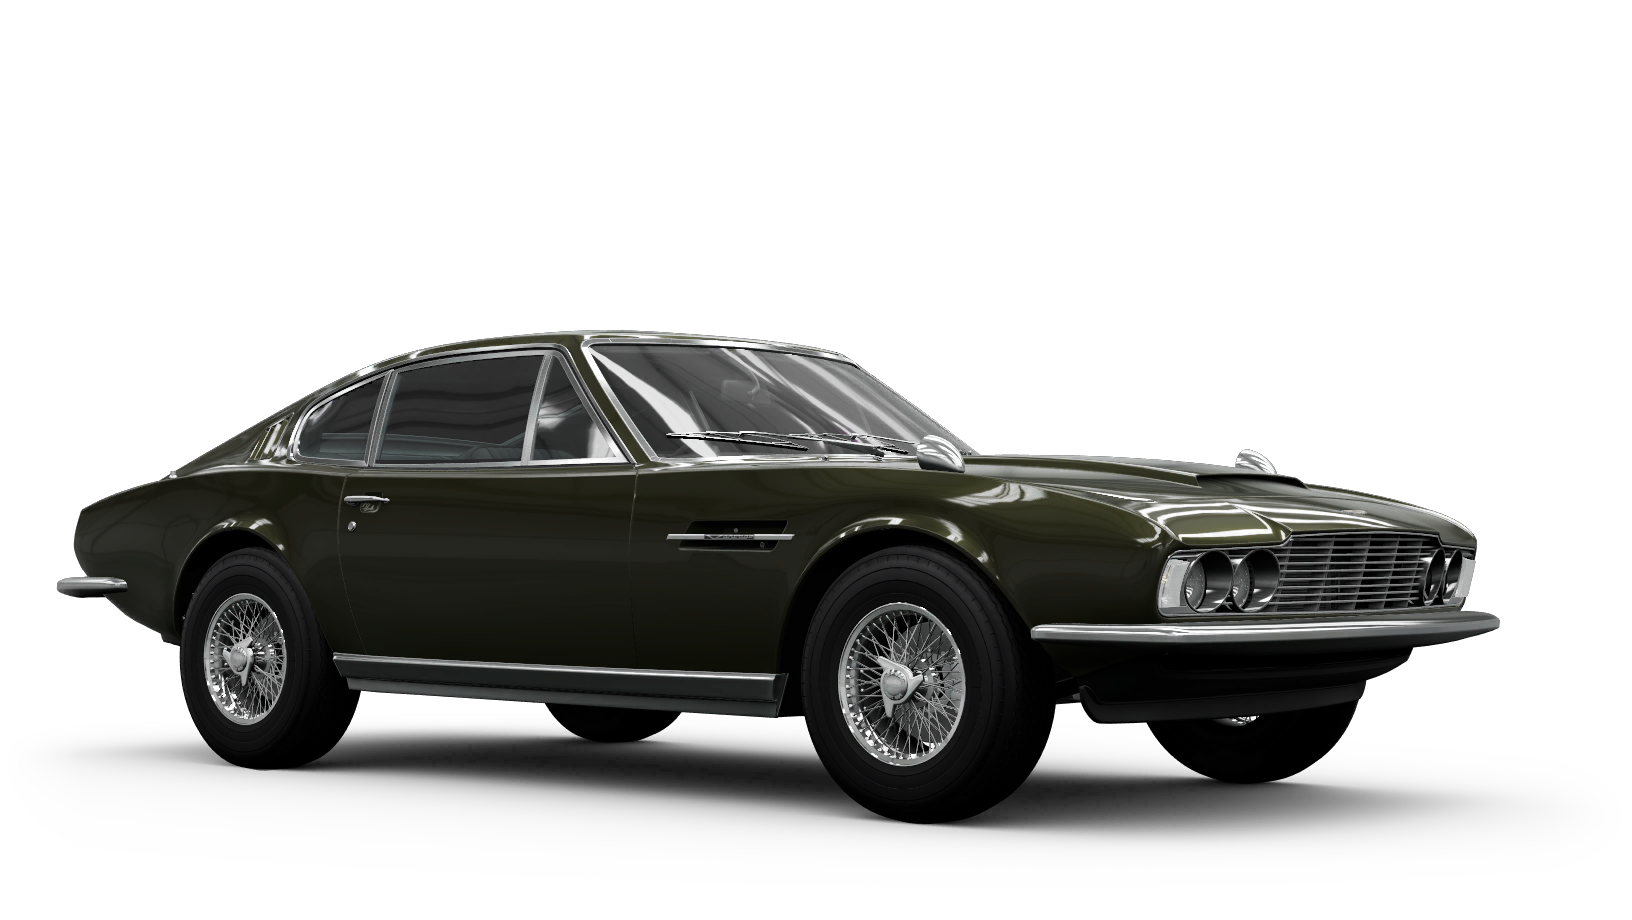 James Bond Edition Aston Martin Dbs 1969 Forza Wiki Fandom